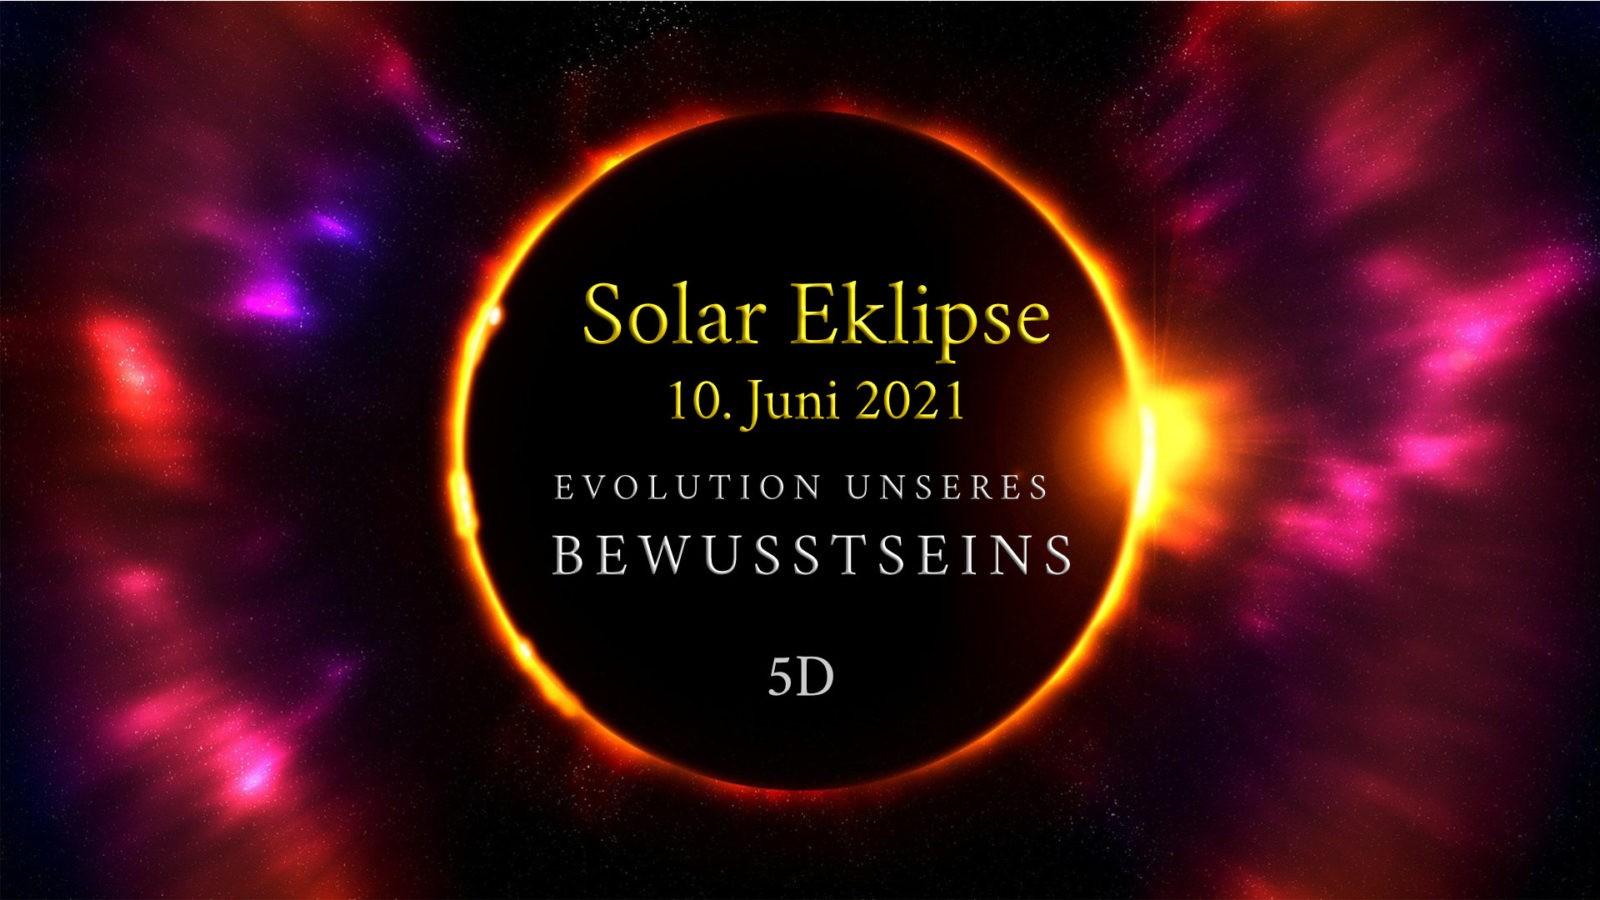 Sonnenfinsternis 10.6.2021